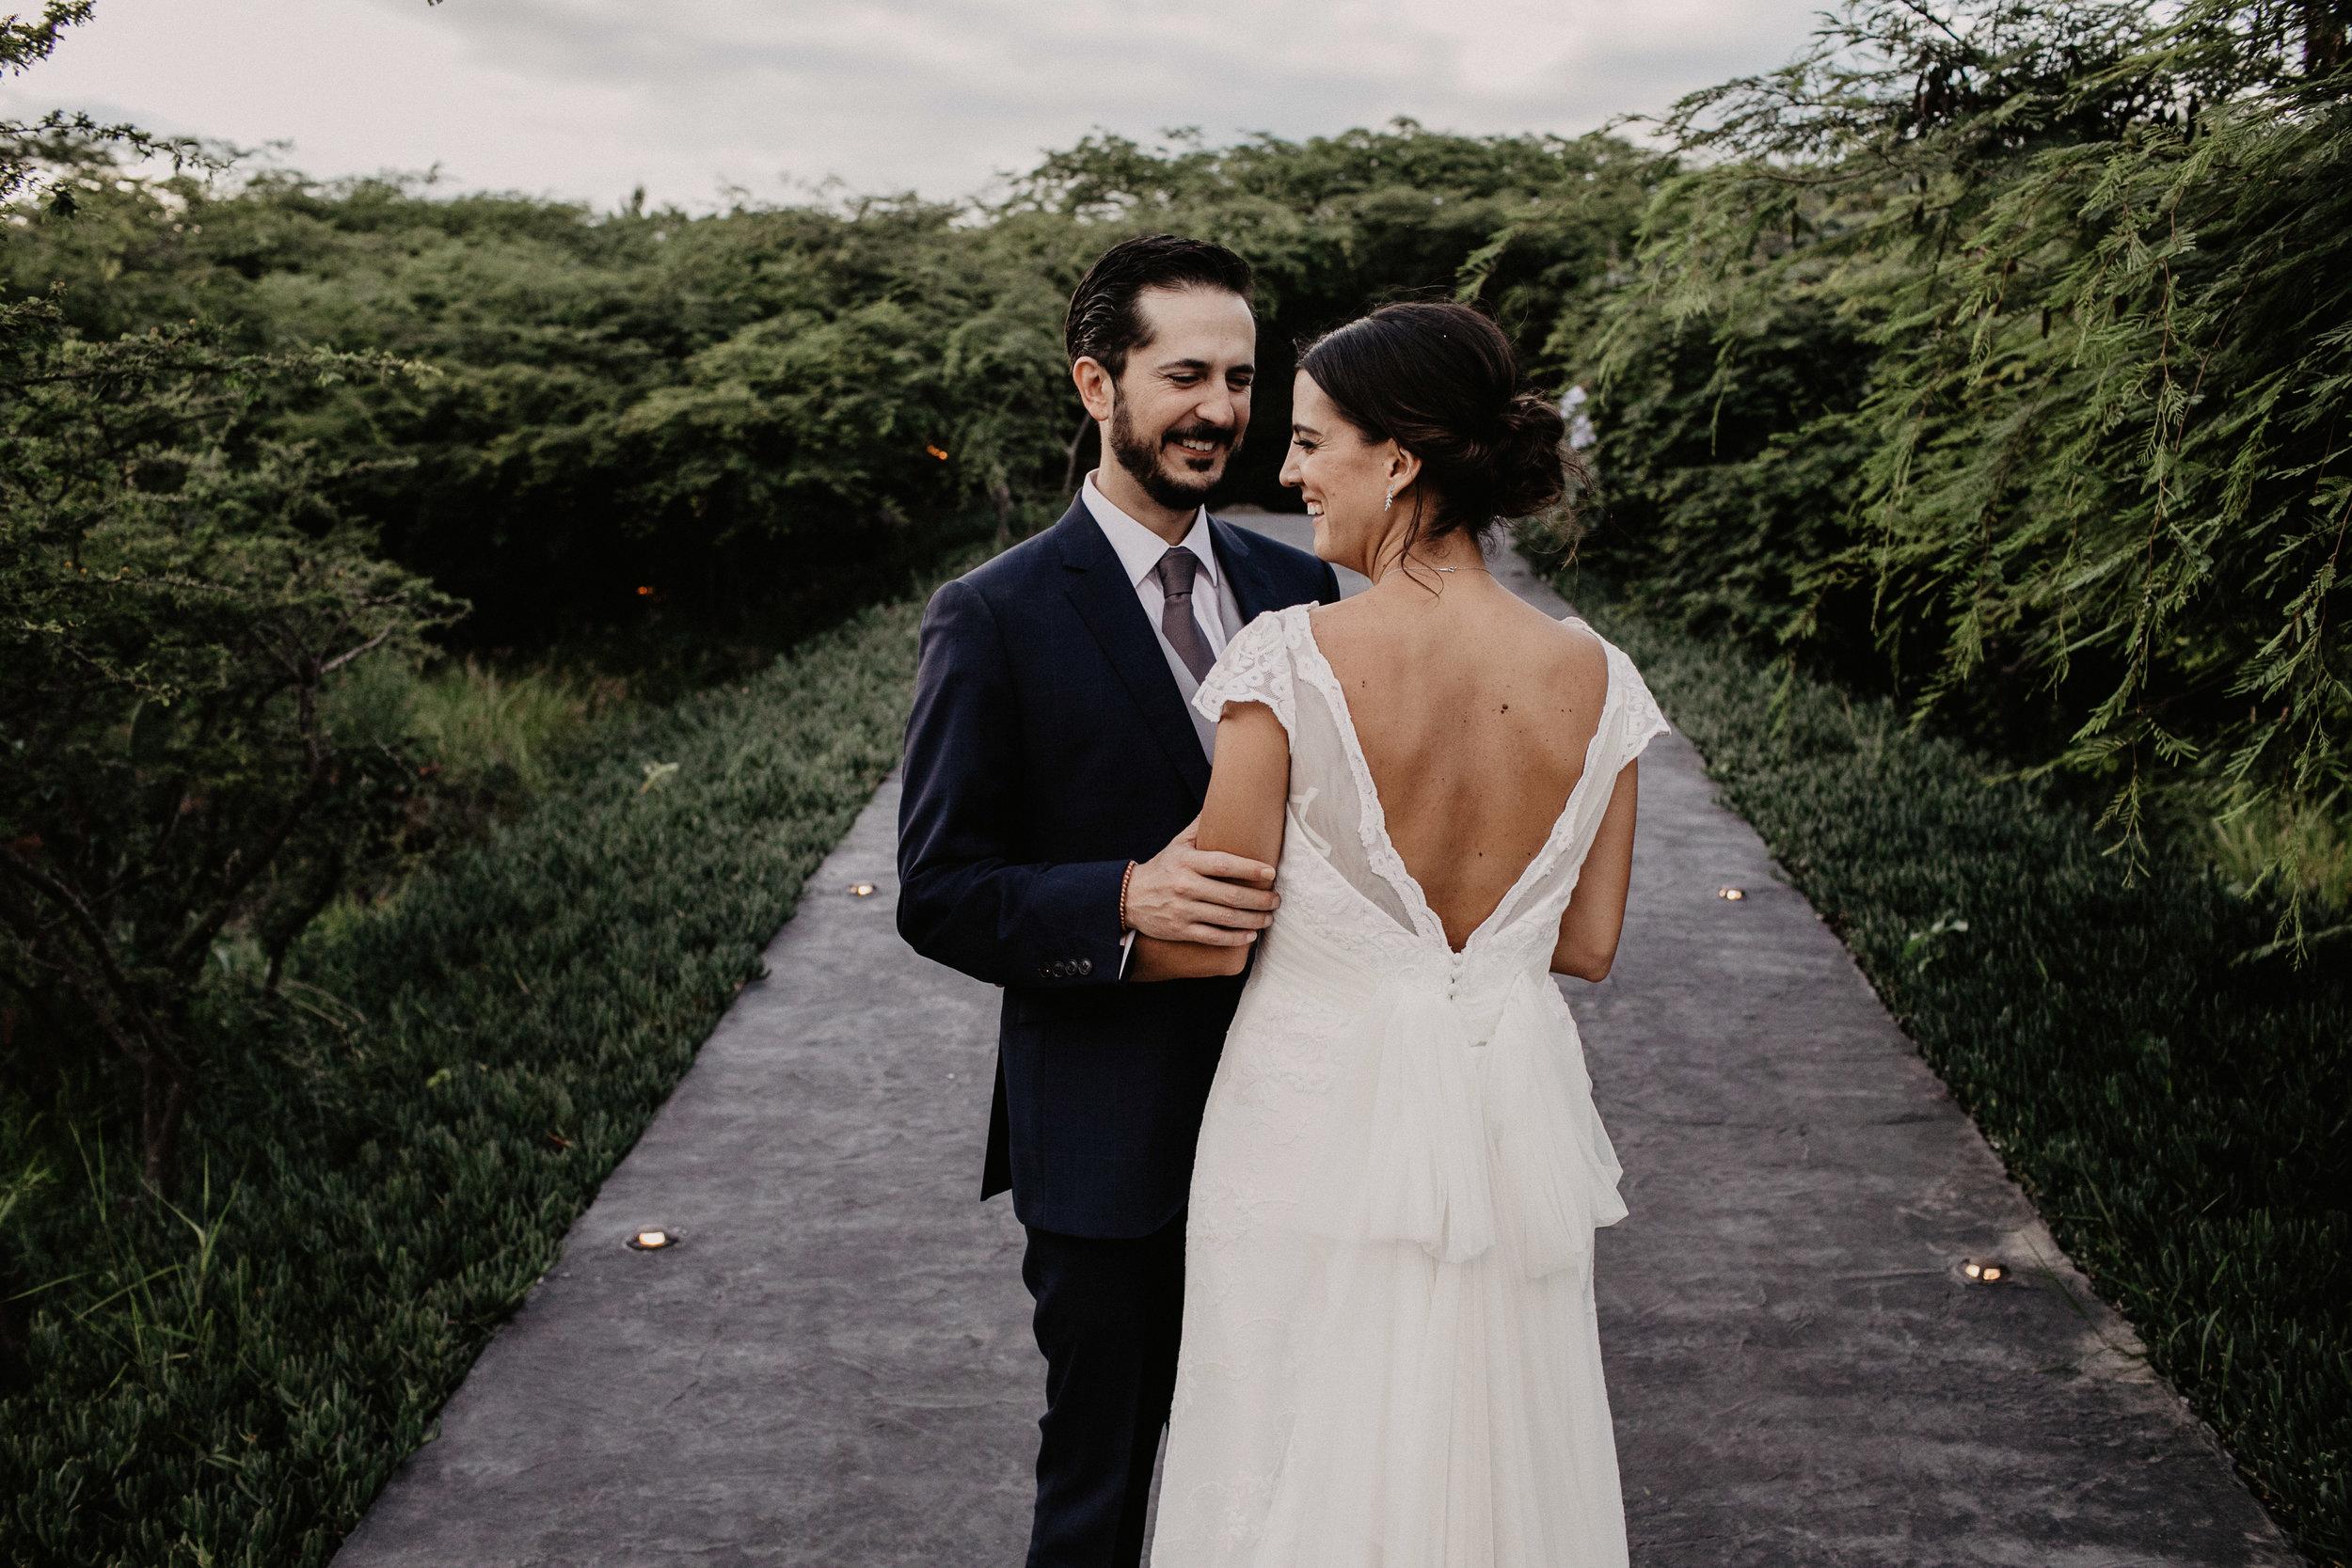 alfonso_flores_destination_wedding_photographer_pau_alonso_1026.JPG